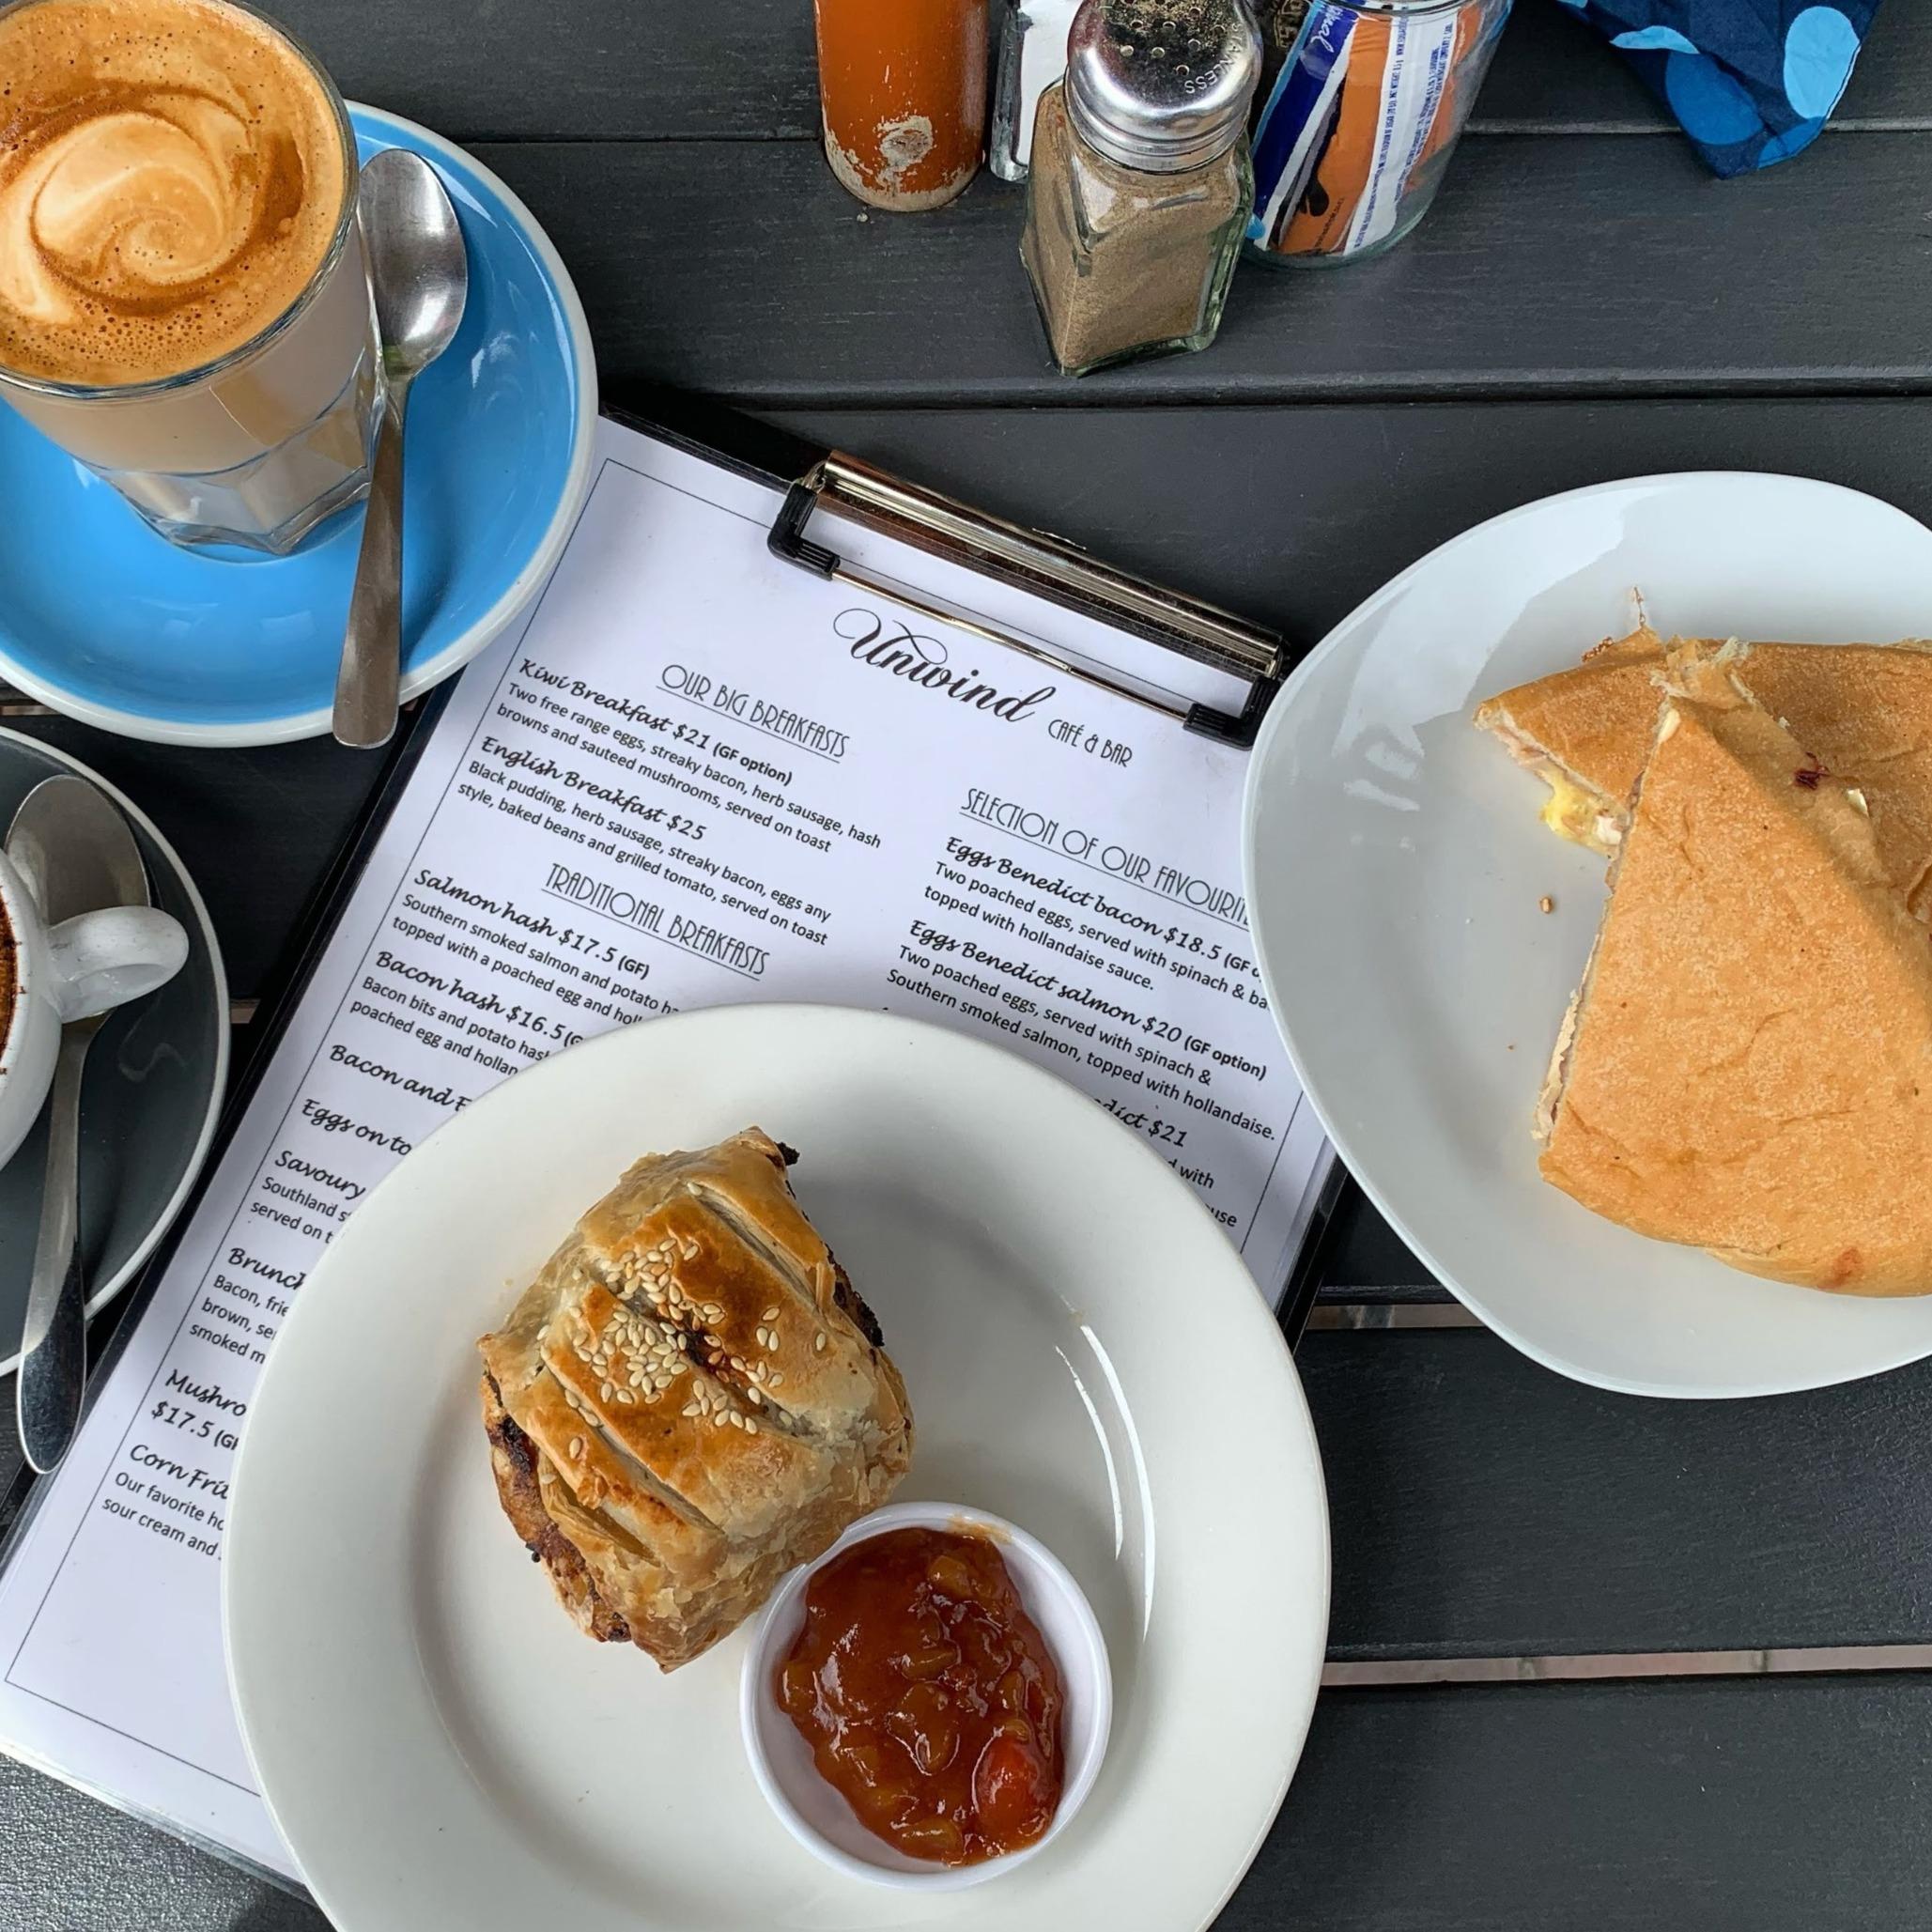 Unwind Cafe and Bar